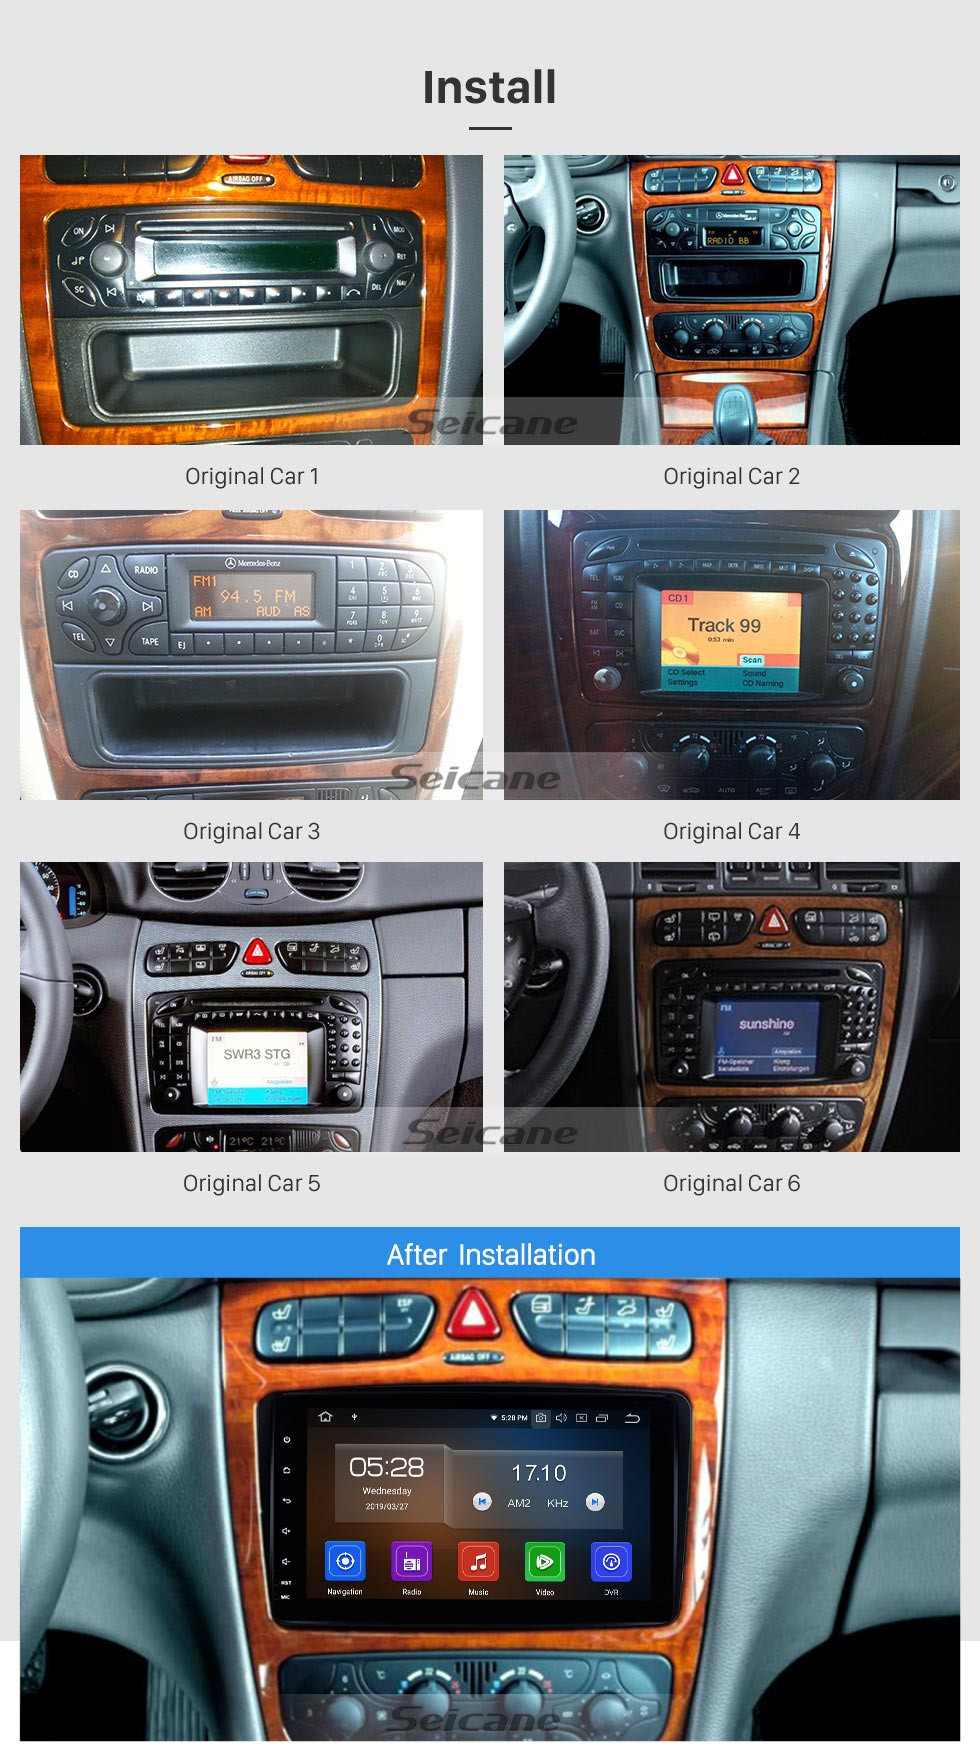 Seicane 2004 Mercedes-Benz Viano W639 OEM Android 10.0 Radio GPS Sat Nav Bluetooth Music USB WIFI Head unit Support TPMS DAB+ Backup Camera DVR Mirror Link Steering Wheel Control